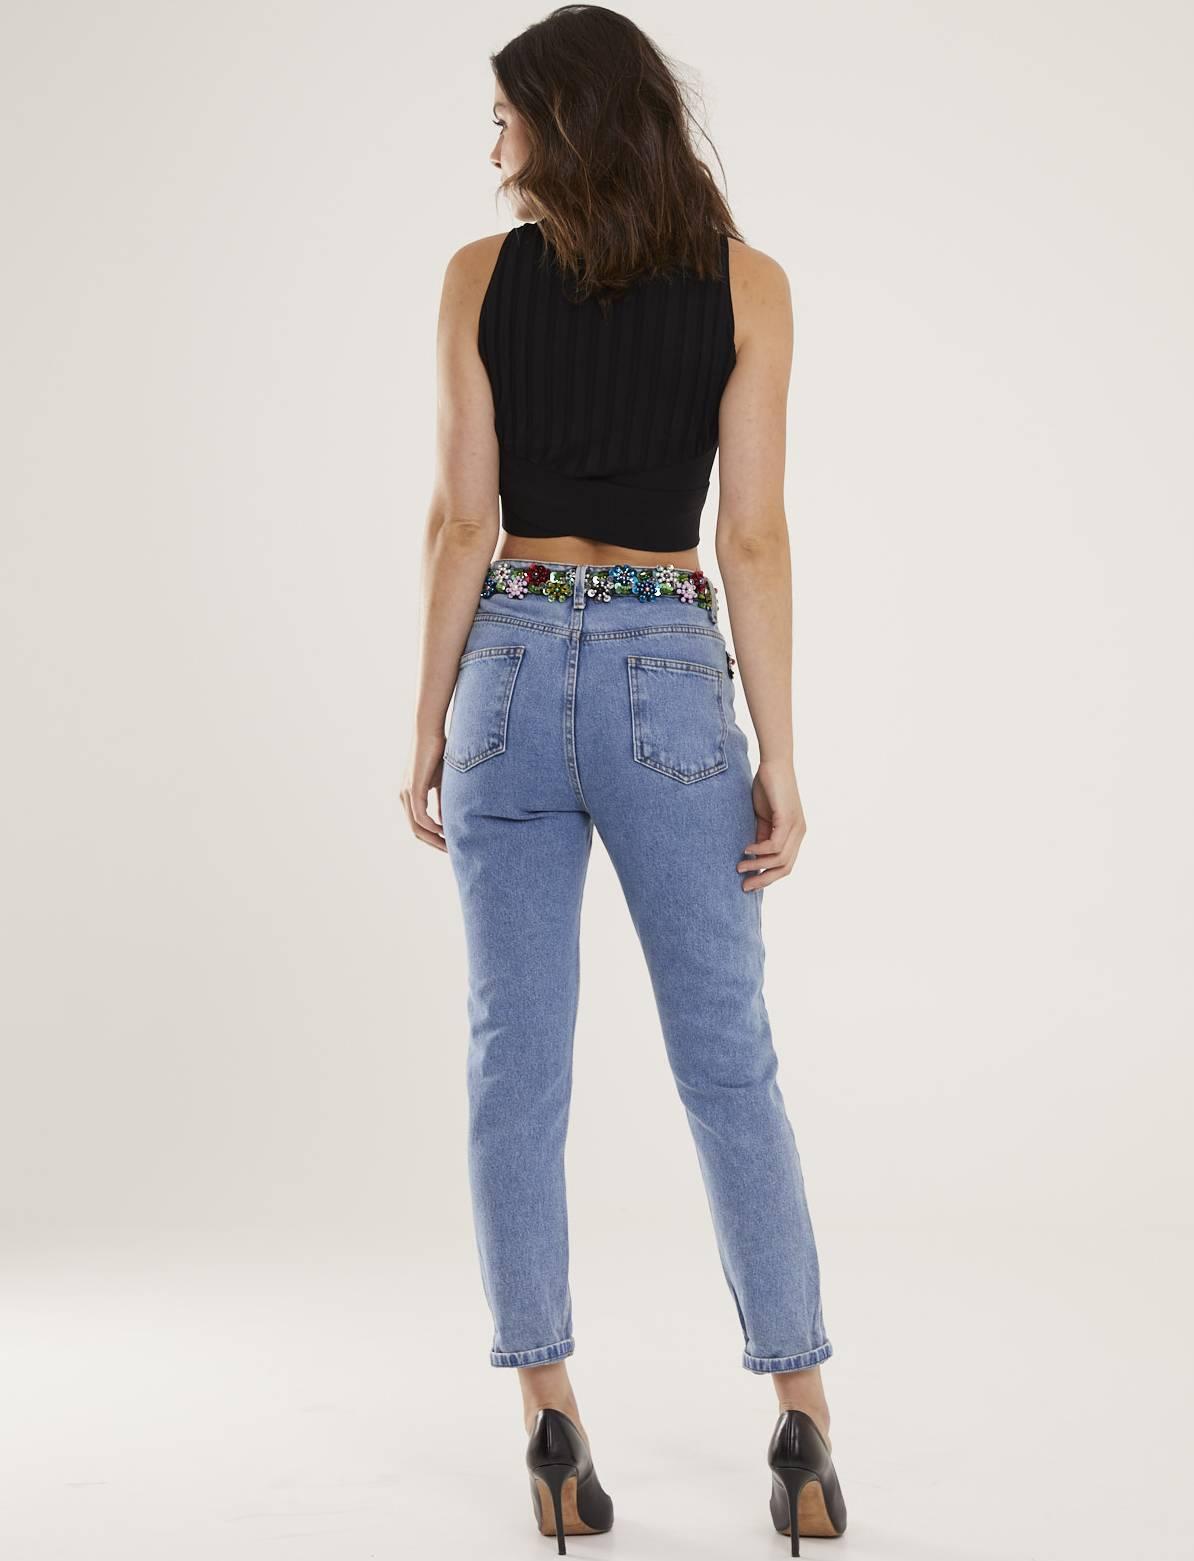 Calça Jeans Feminina Bordada Atelier Esmeralda